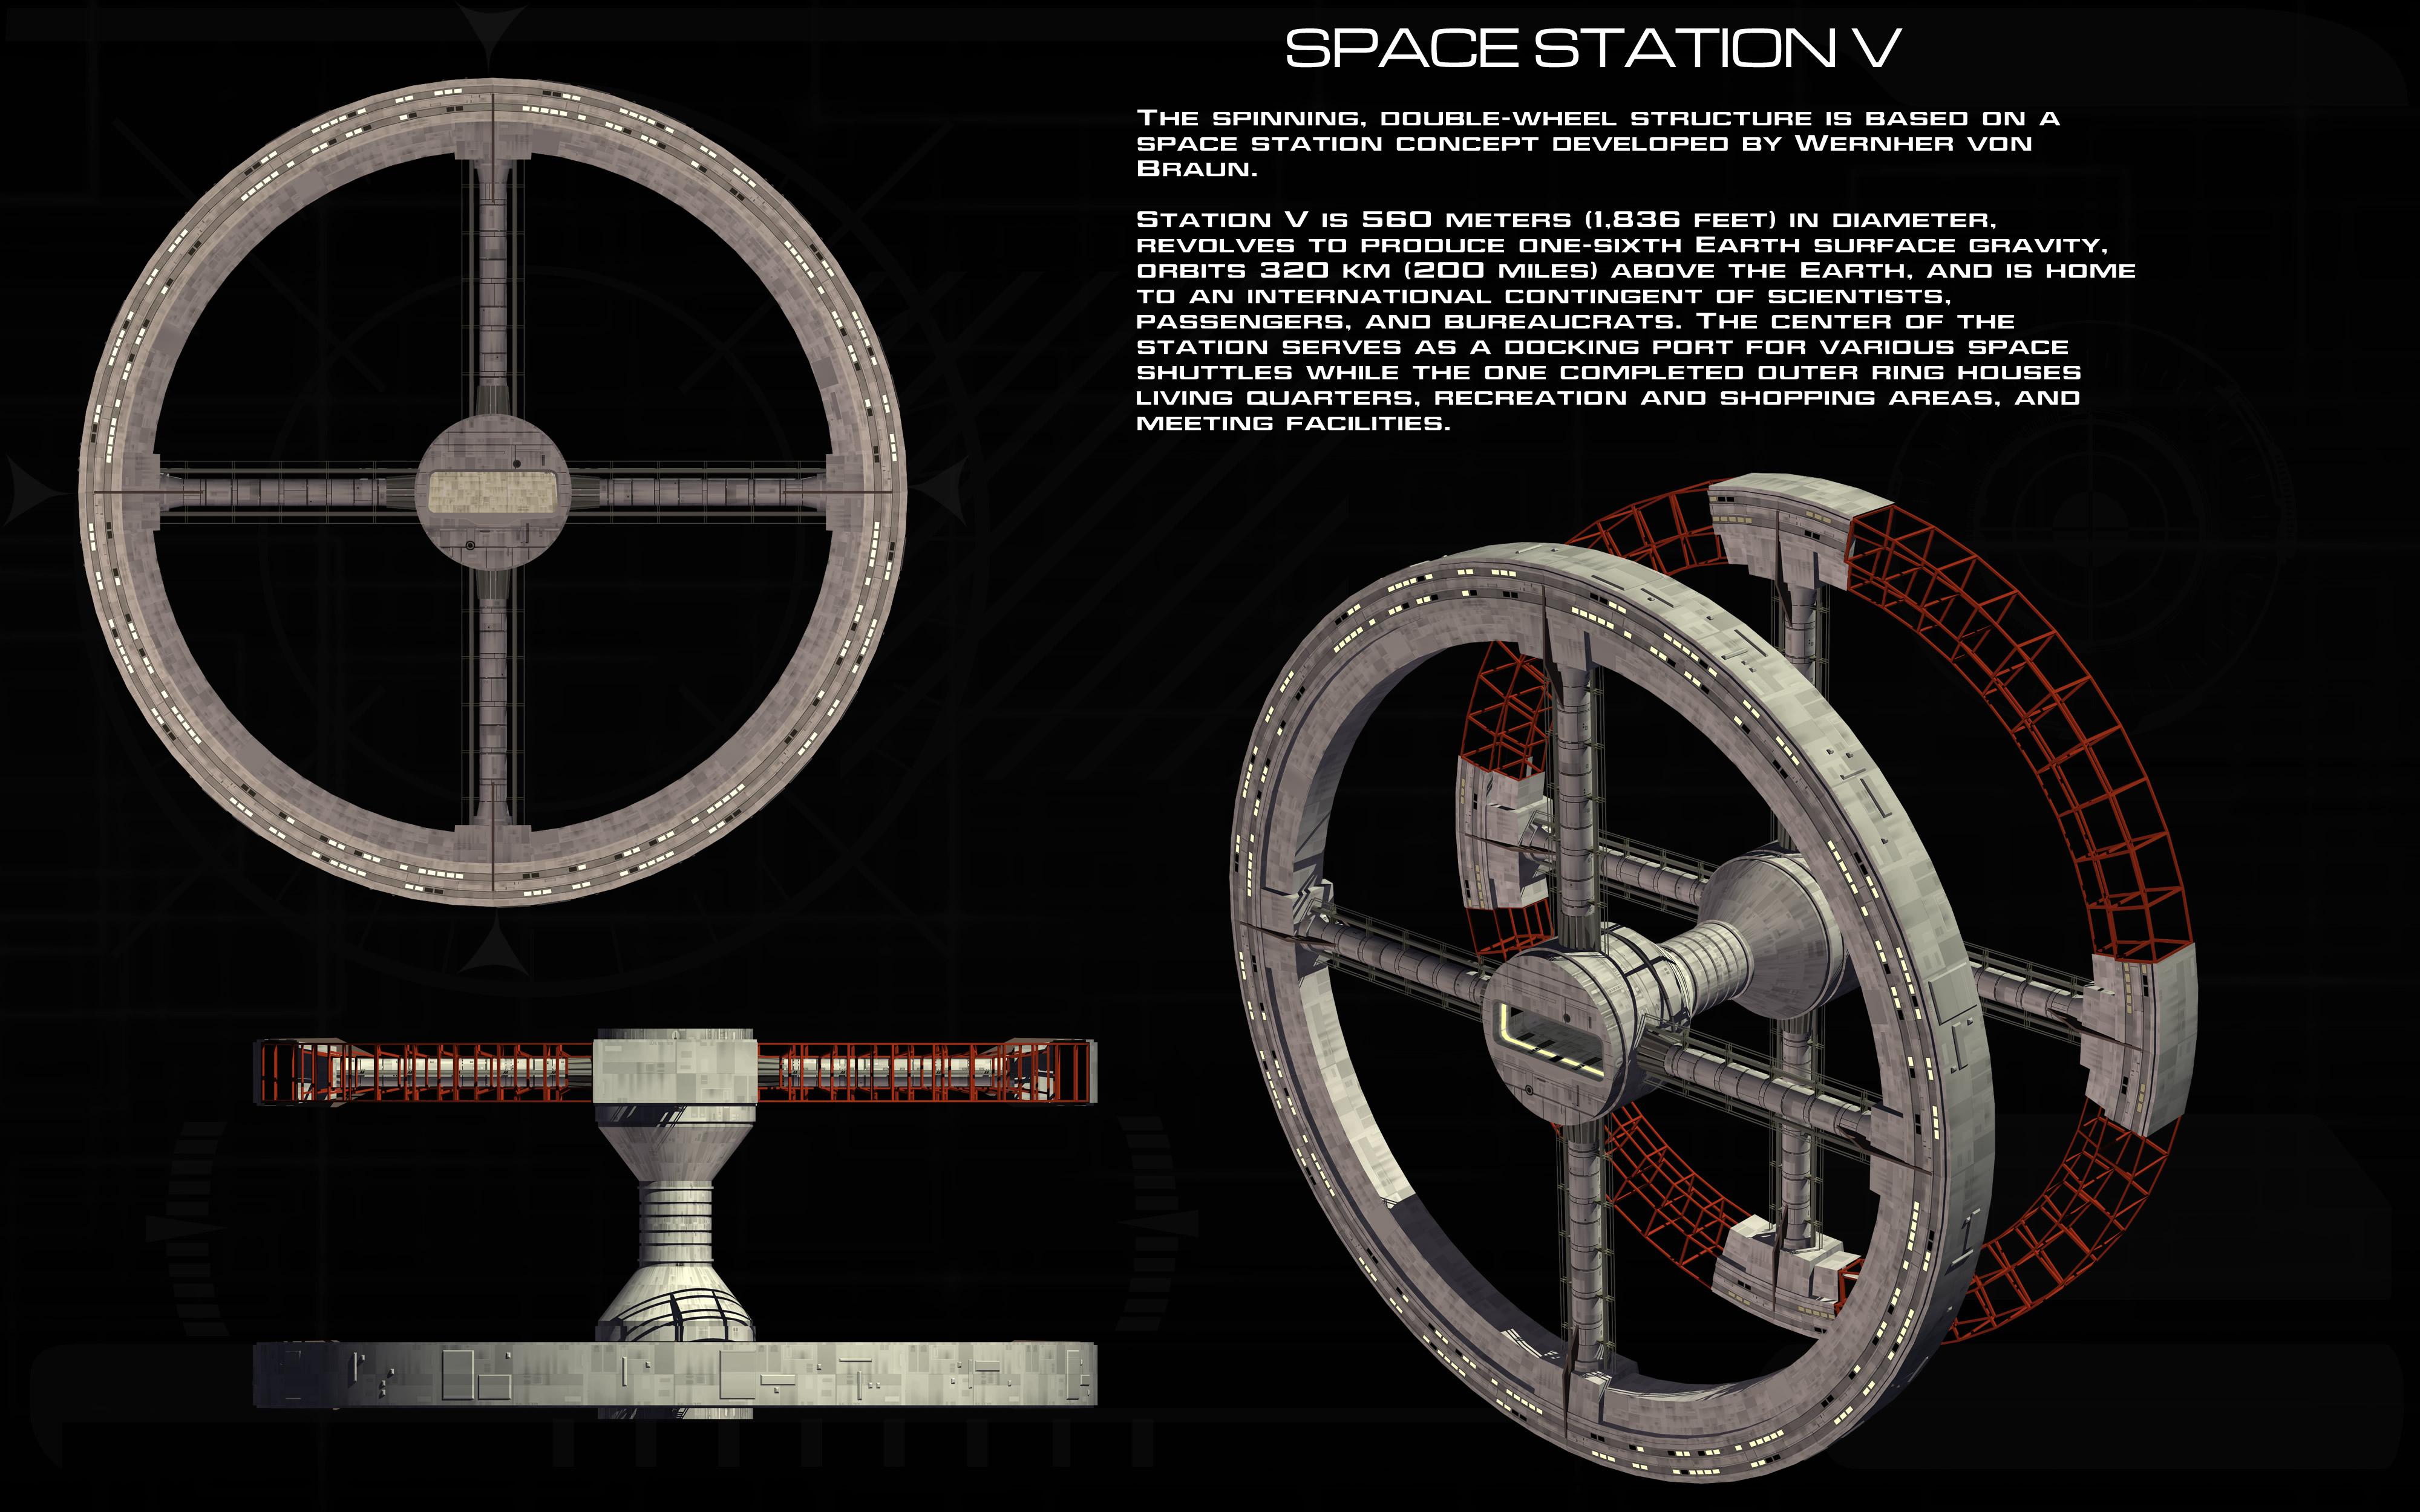 space_station_v_ortho_by_unusualsuspex-d6ywb8o.jpg